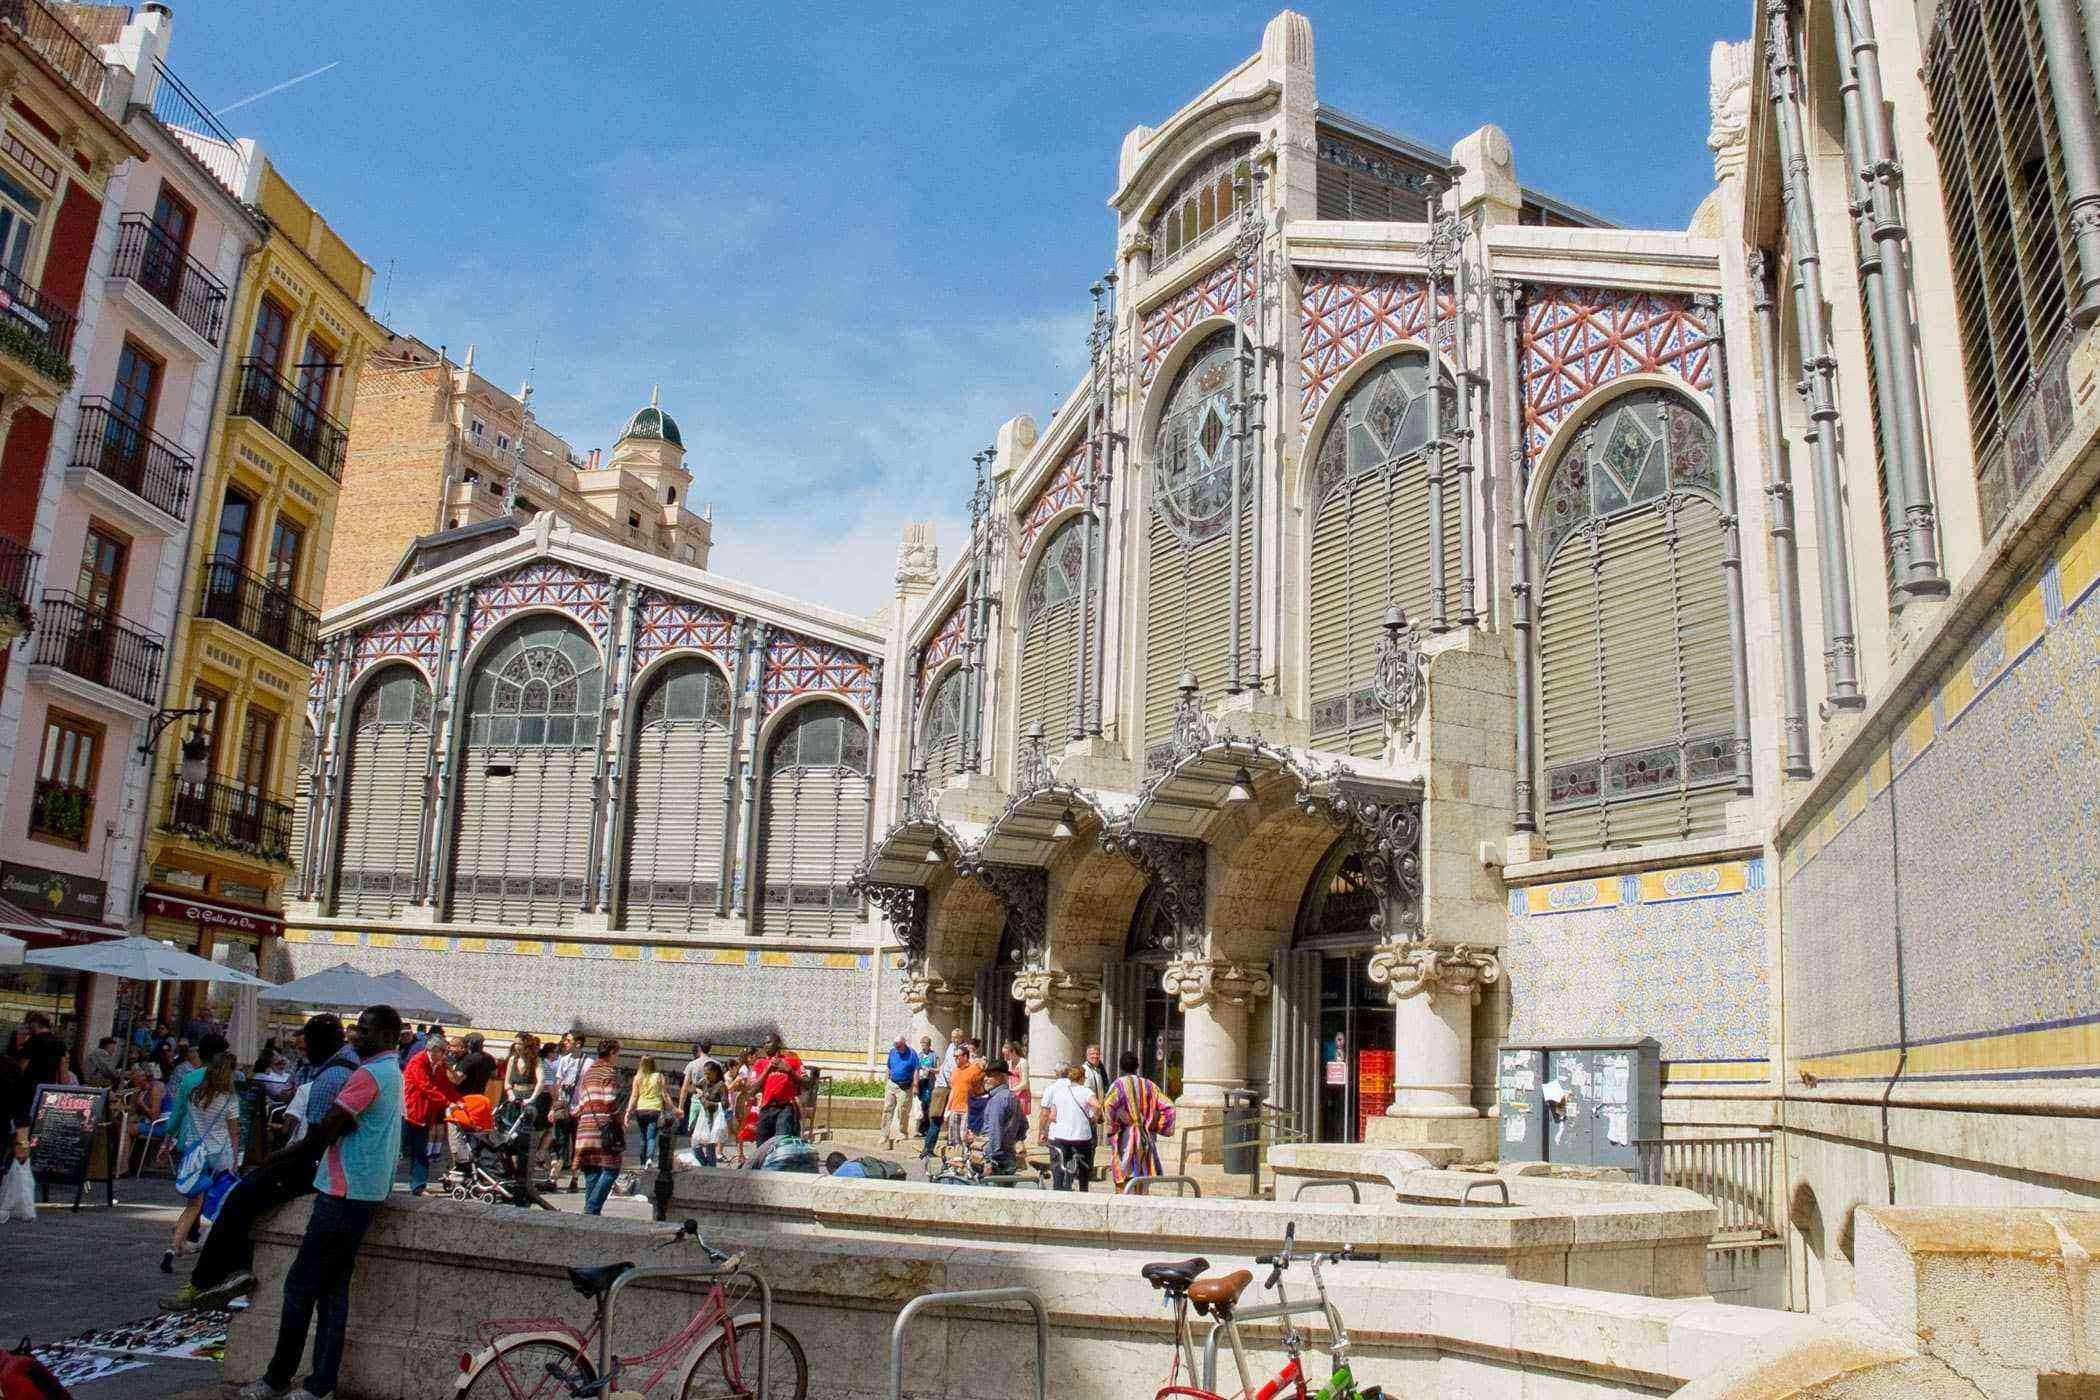 Valencia-Buildings-Mercado-Central-de-Valencia-2